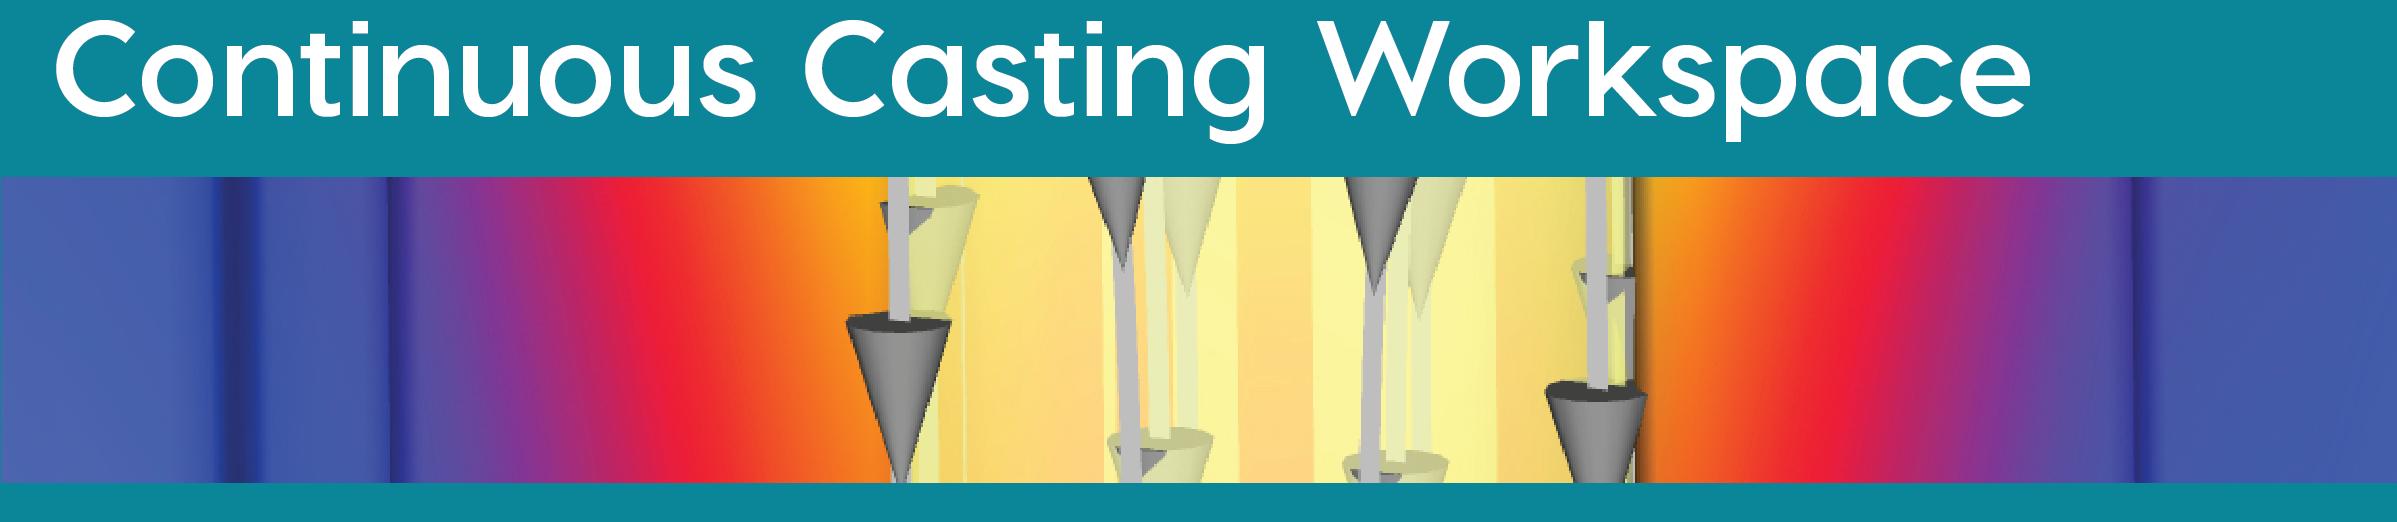 Continuous casting workspace